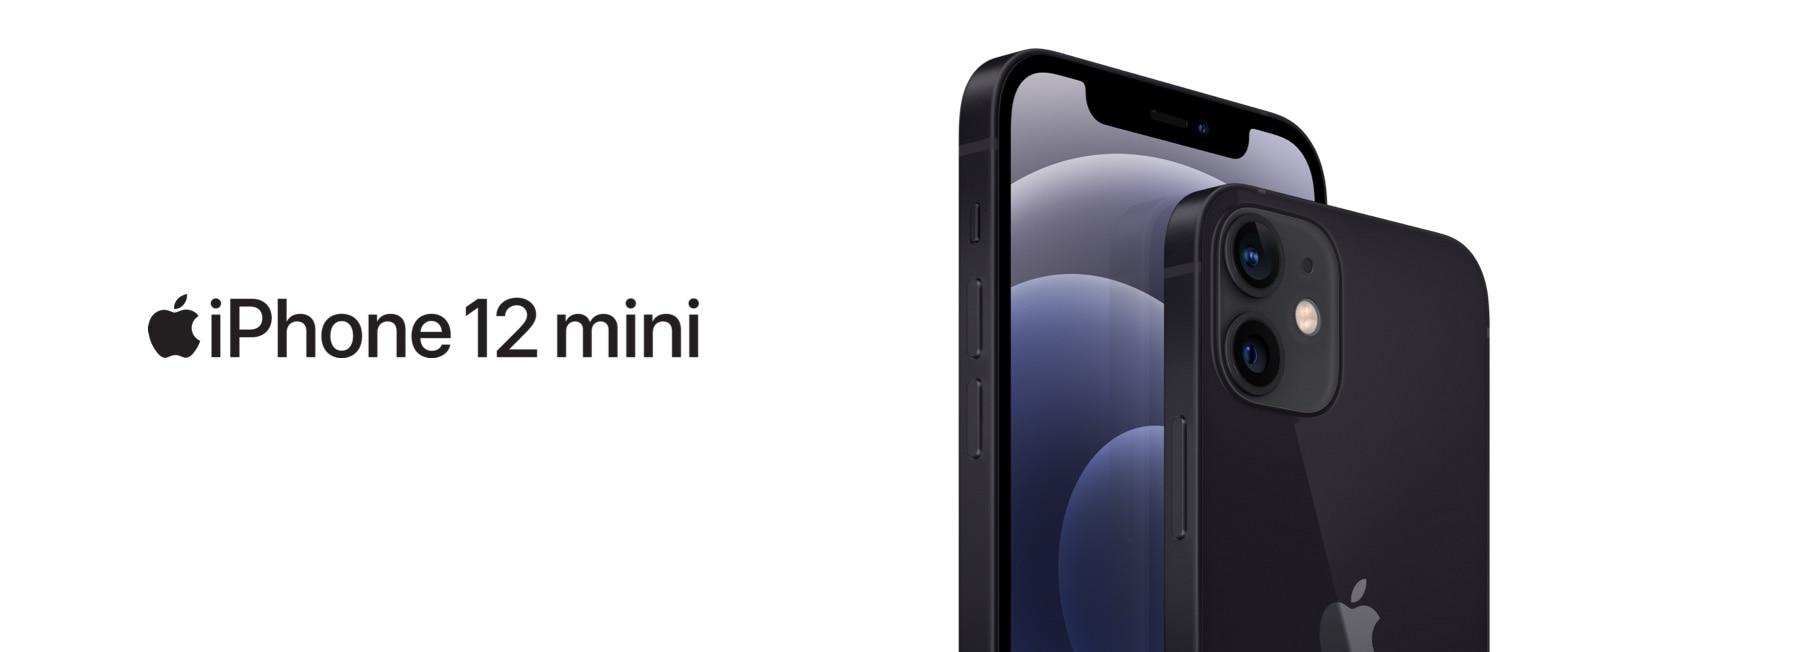 Conoce el iPhone 12 Mini 5G